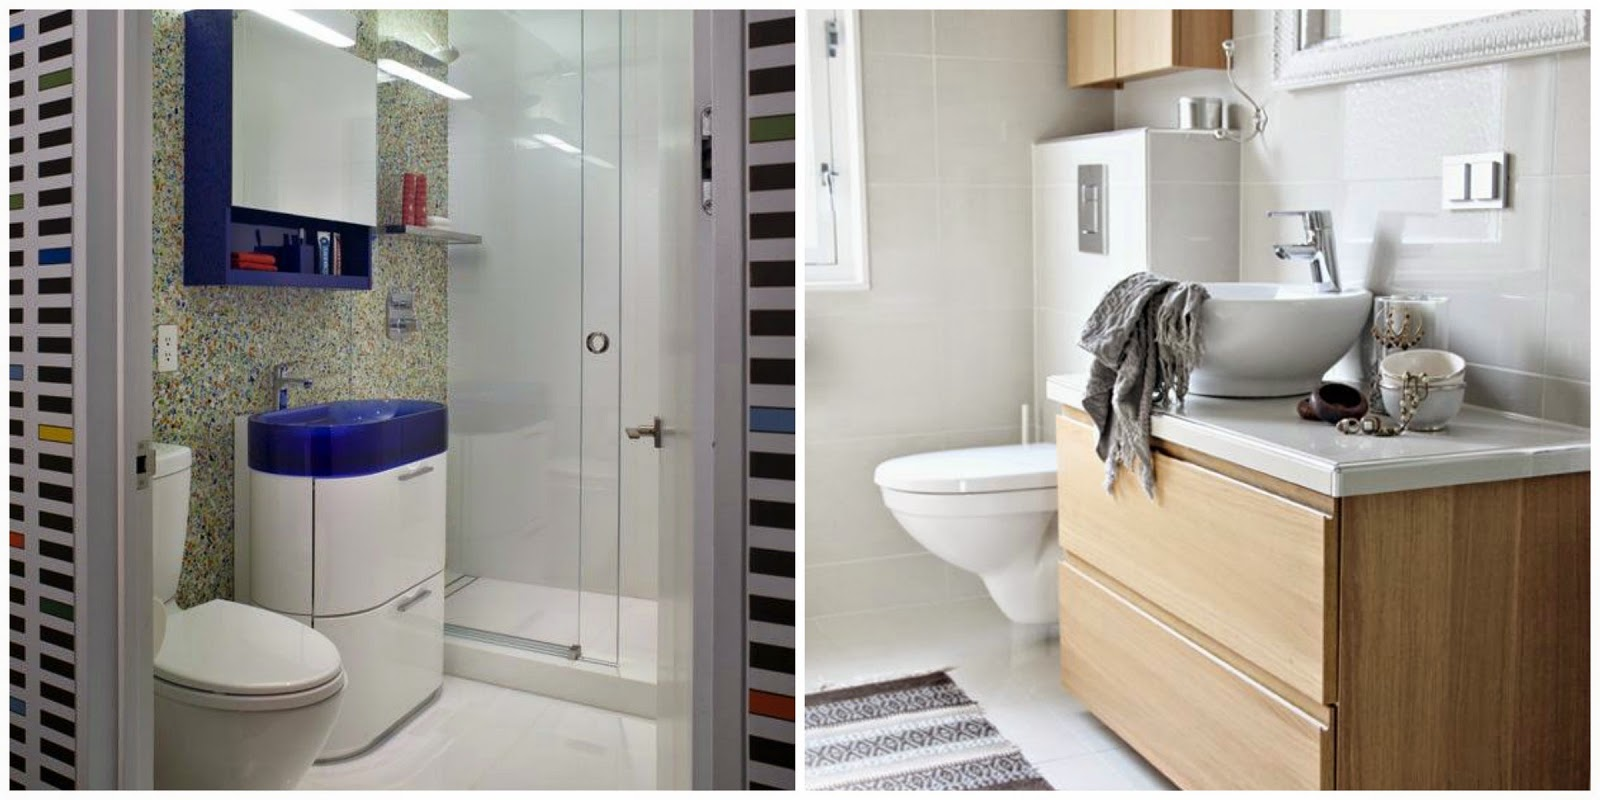 Ideias para decorar o seu banheiro Mari Beleza Pura #614830 1600x800 Banheiro Cor Ideal